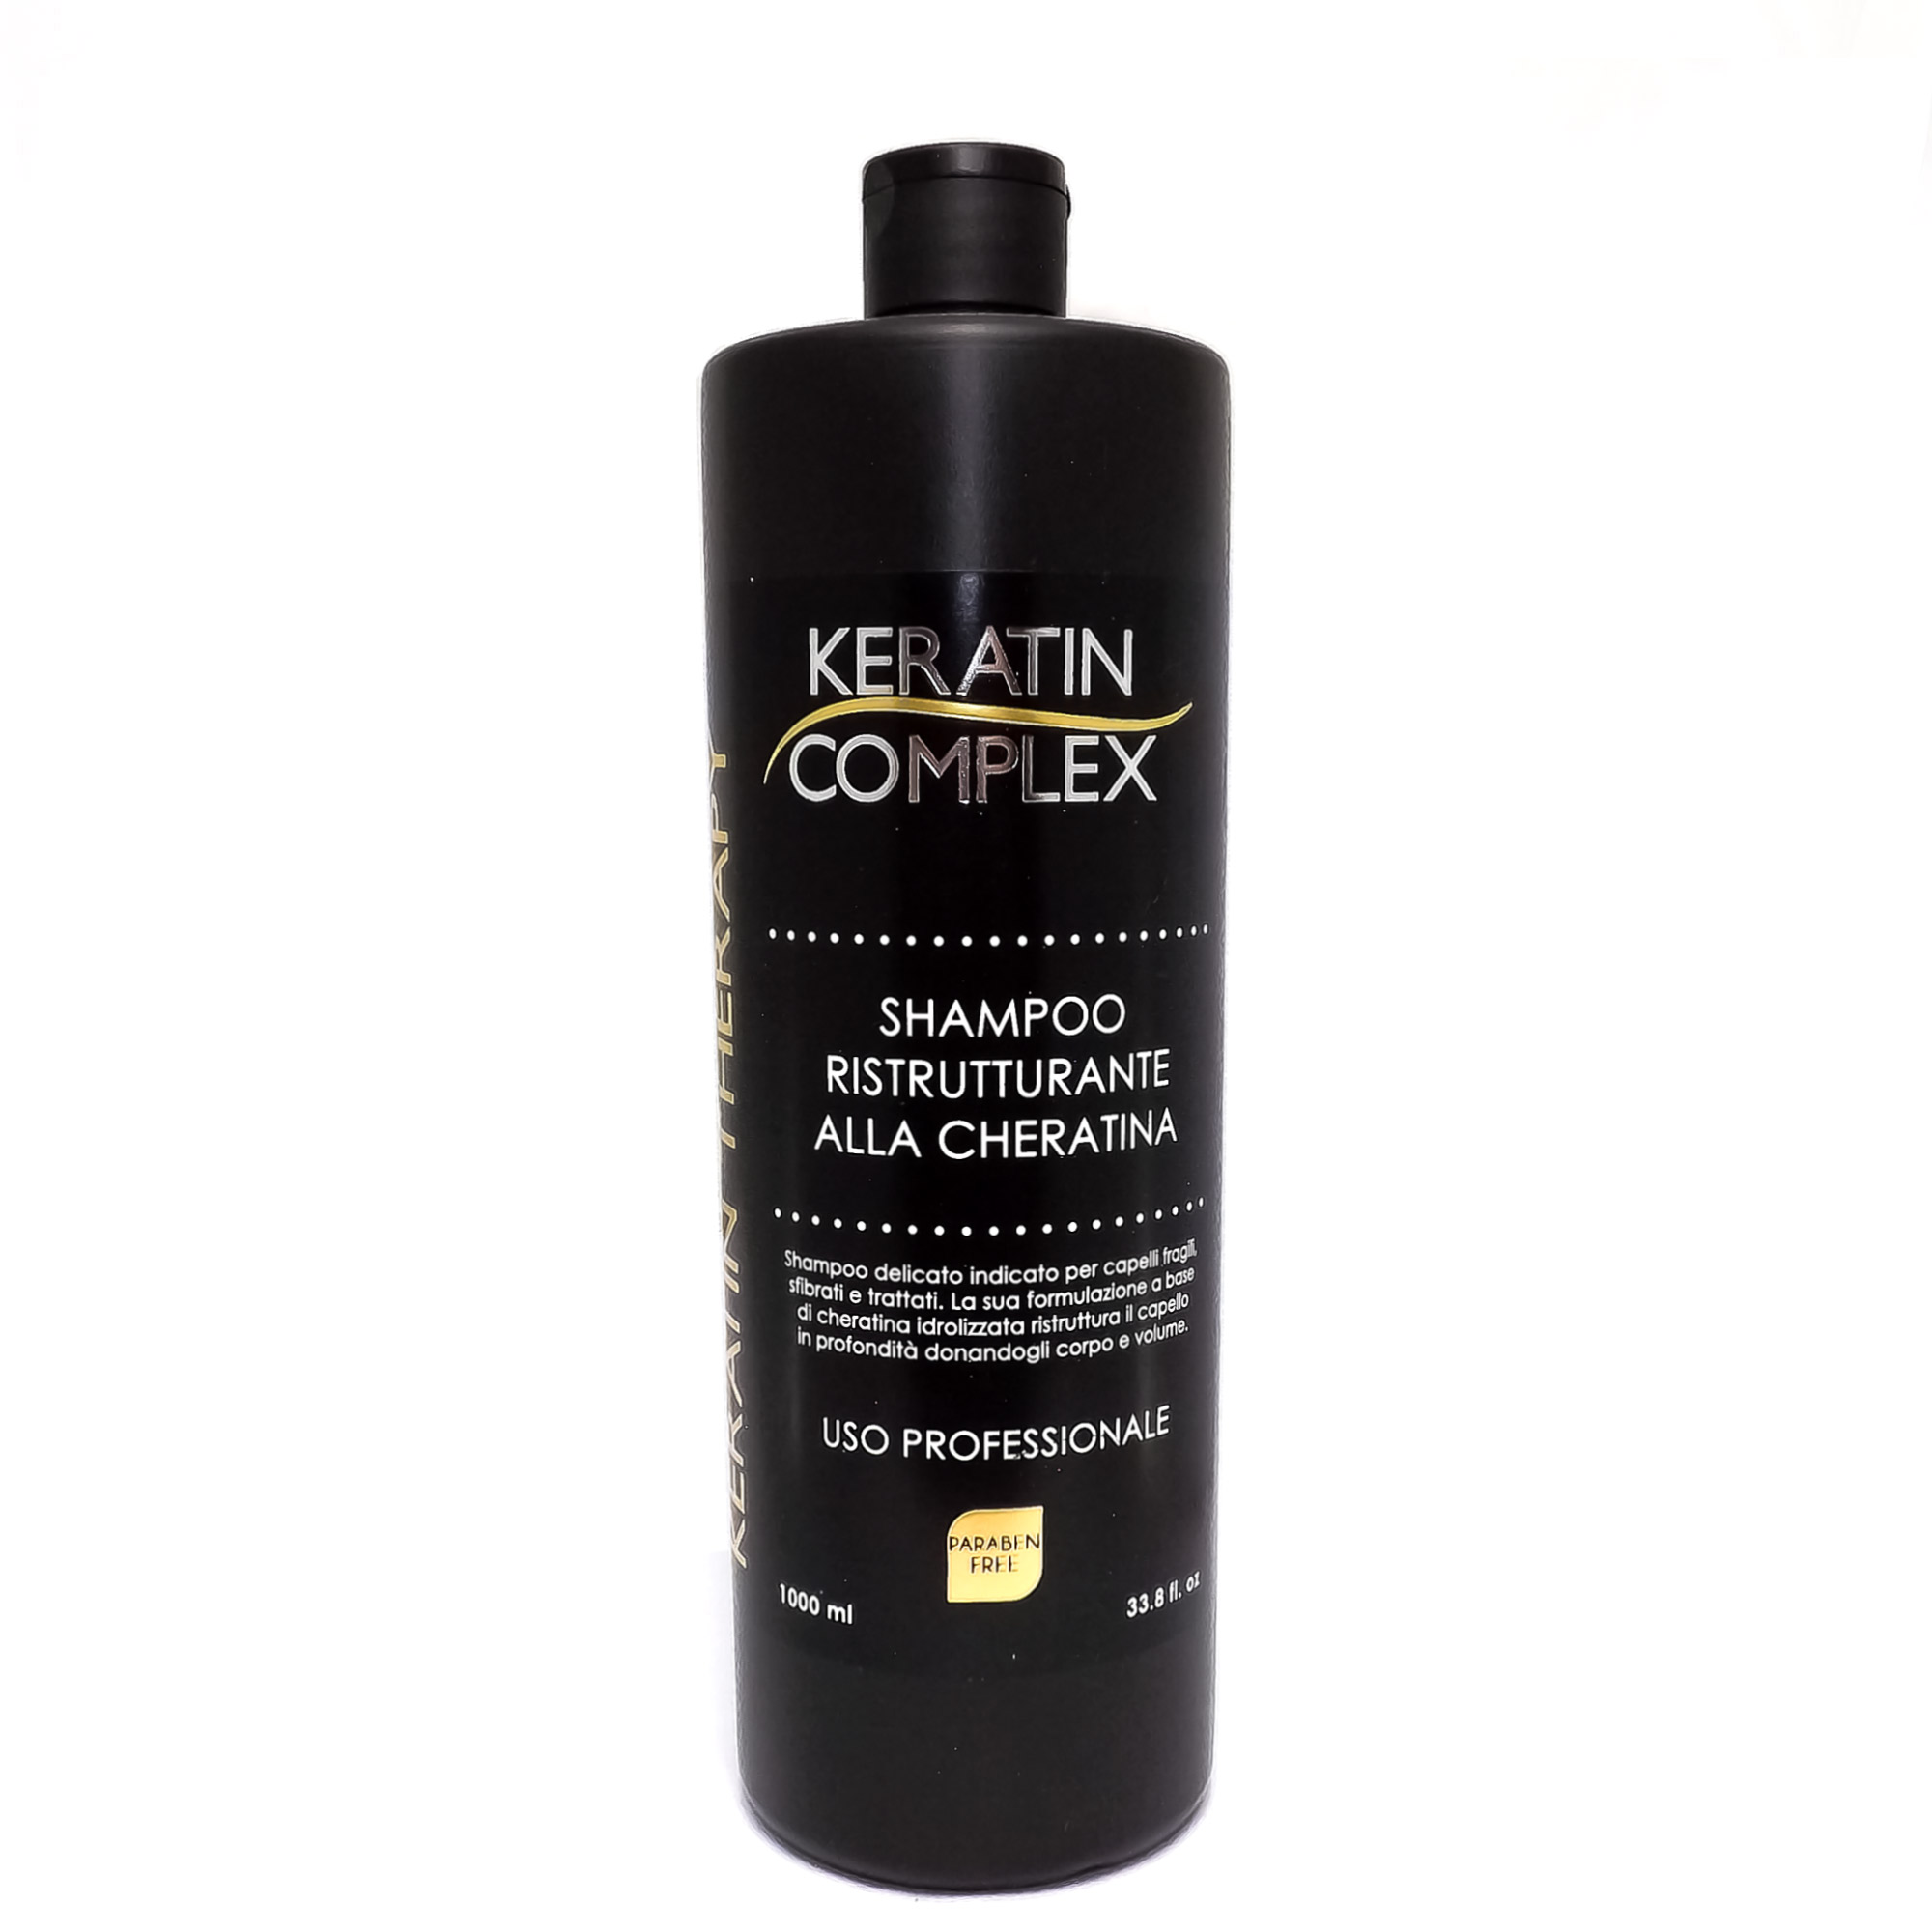 KERATIN COMPLEX RISTRUTTURANTE THE KERATIN SHAMPOO 1000 ML-0789